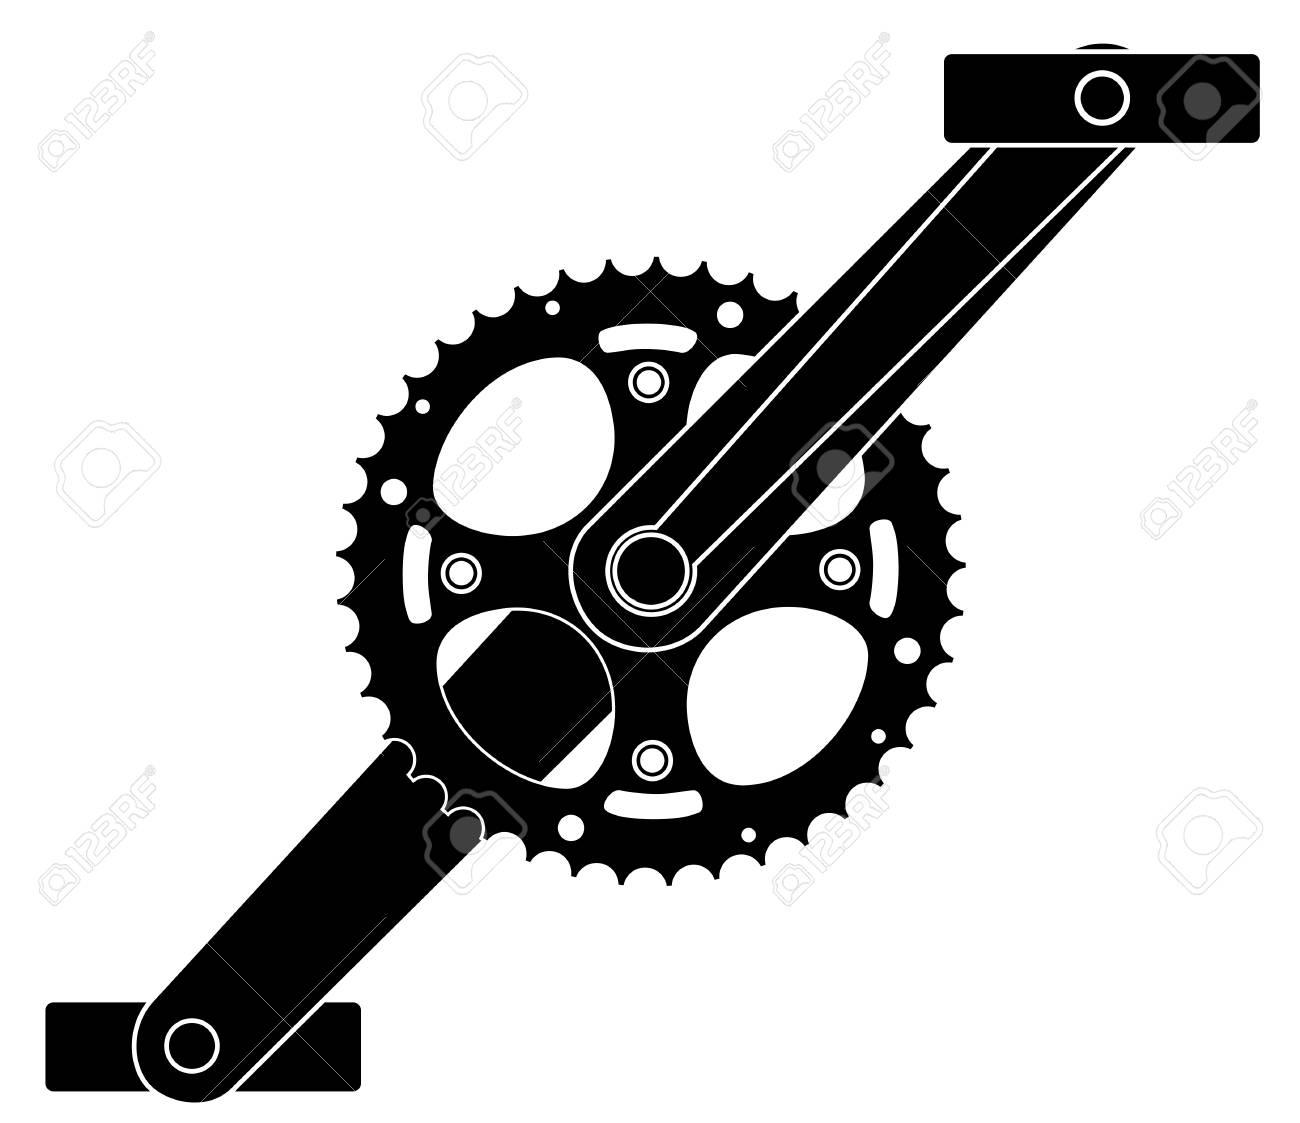 Bicycle cogwheel sprocket crankset symbol vector eps 10 royalty bicycle cogwheel sprocket crankset symbol vector eps 10 stock vector 79072752 biocorpaavc